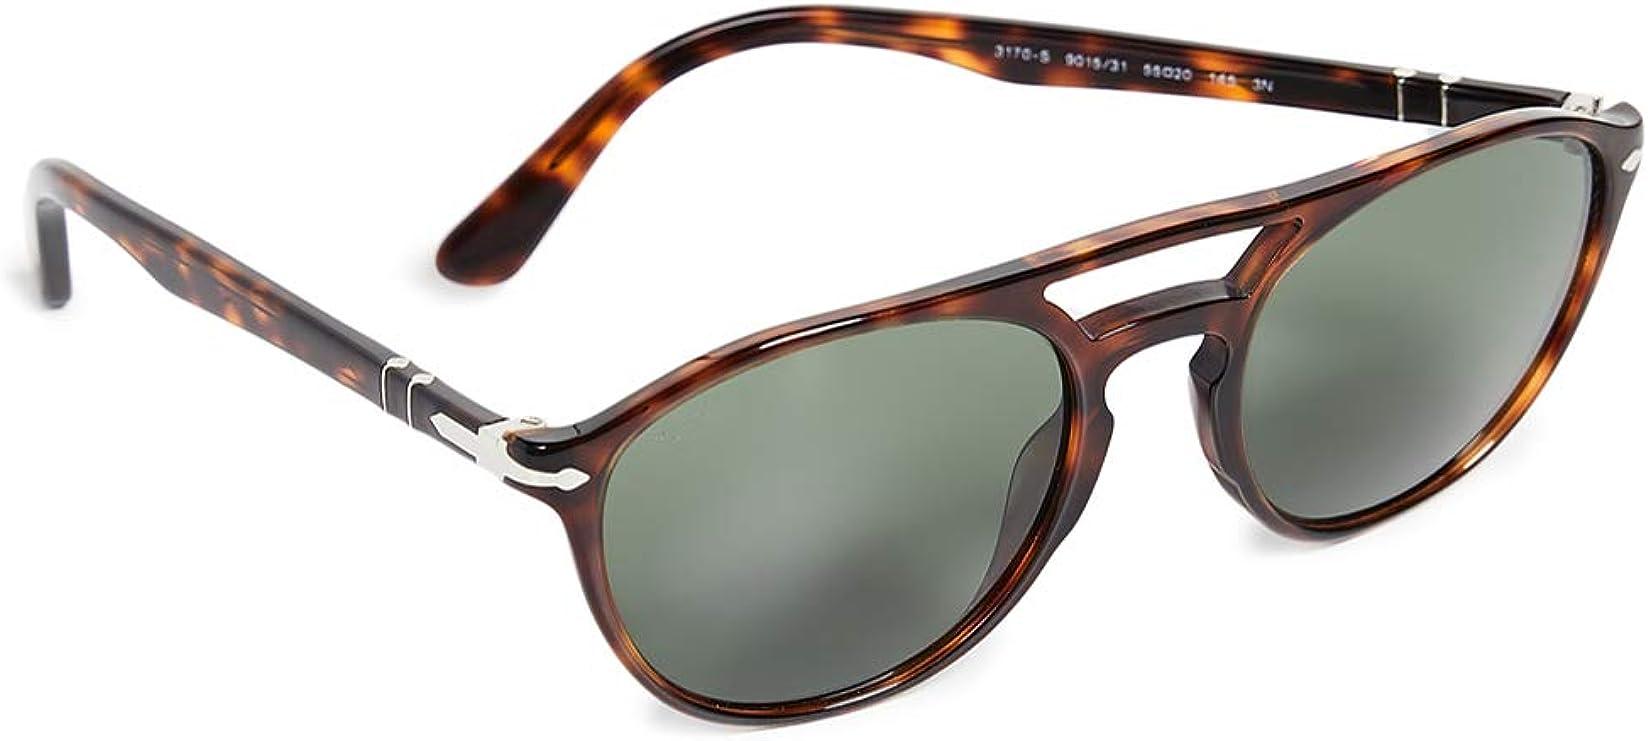 TALLA 55. Persol 3170, Gafas de Sol Unisex-Adulto